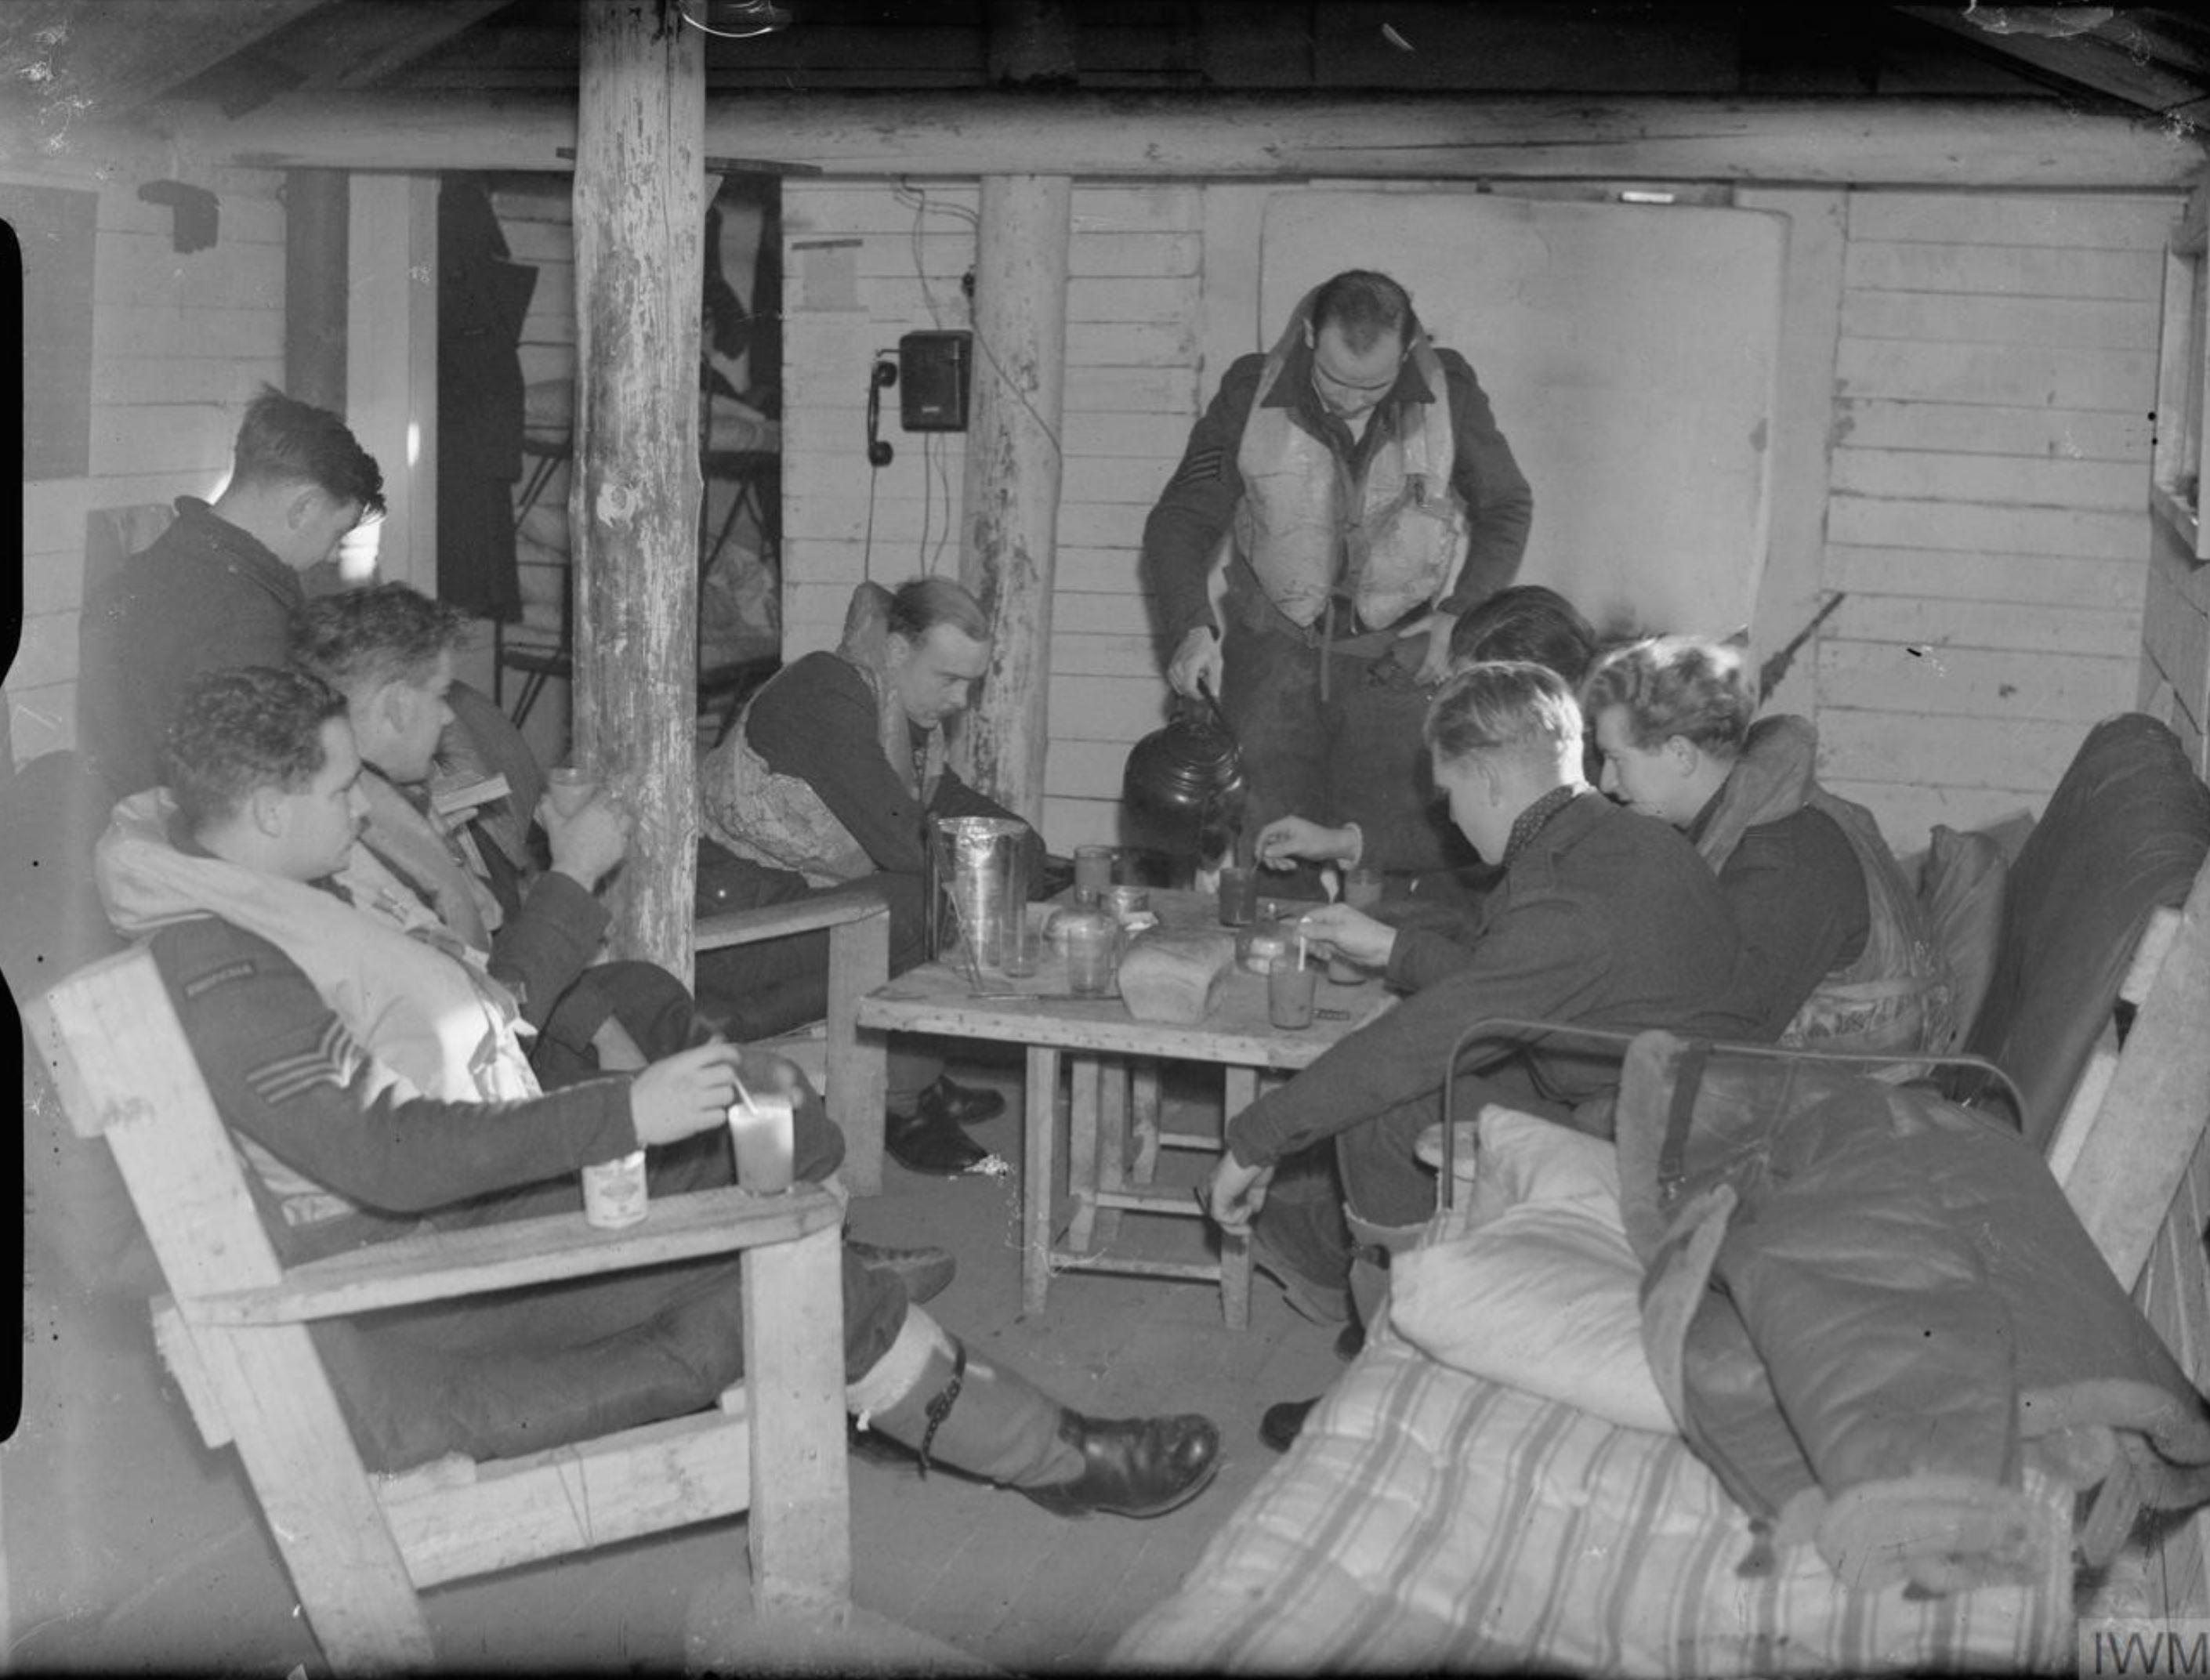 Aircrew from RAF 151 Wing in their barracks Murmansk Vaenga USSR 1941 IWM CR91